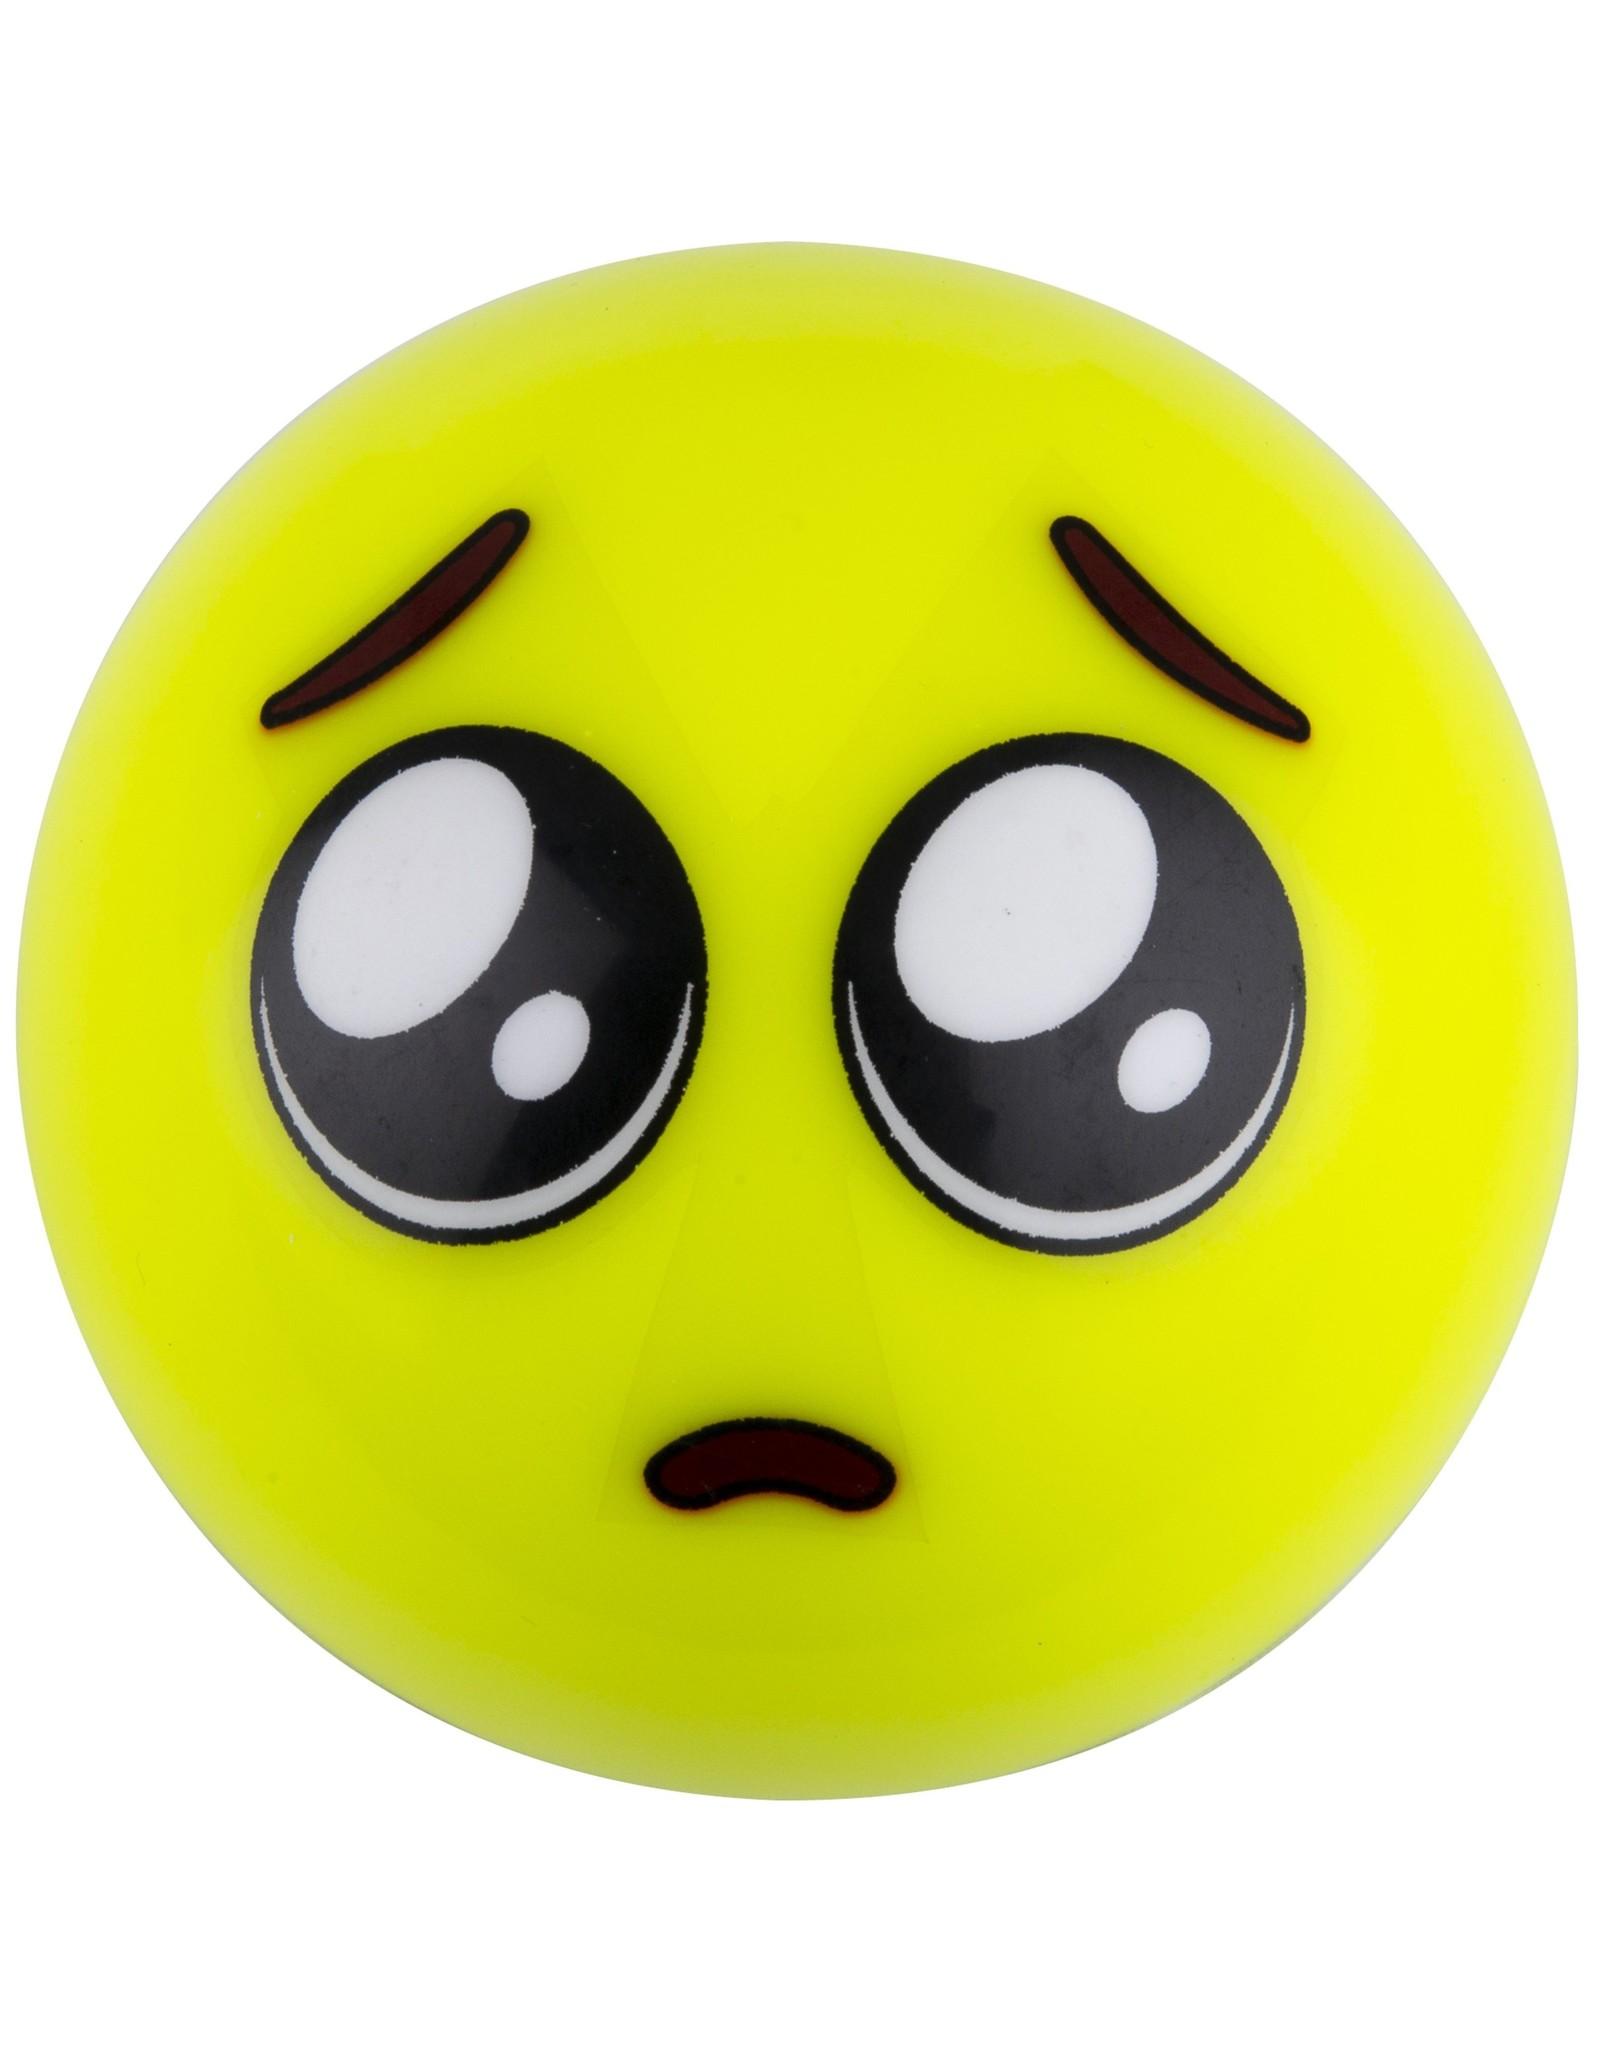 Grays BALL EMOJI EMOTIONAL